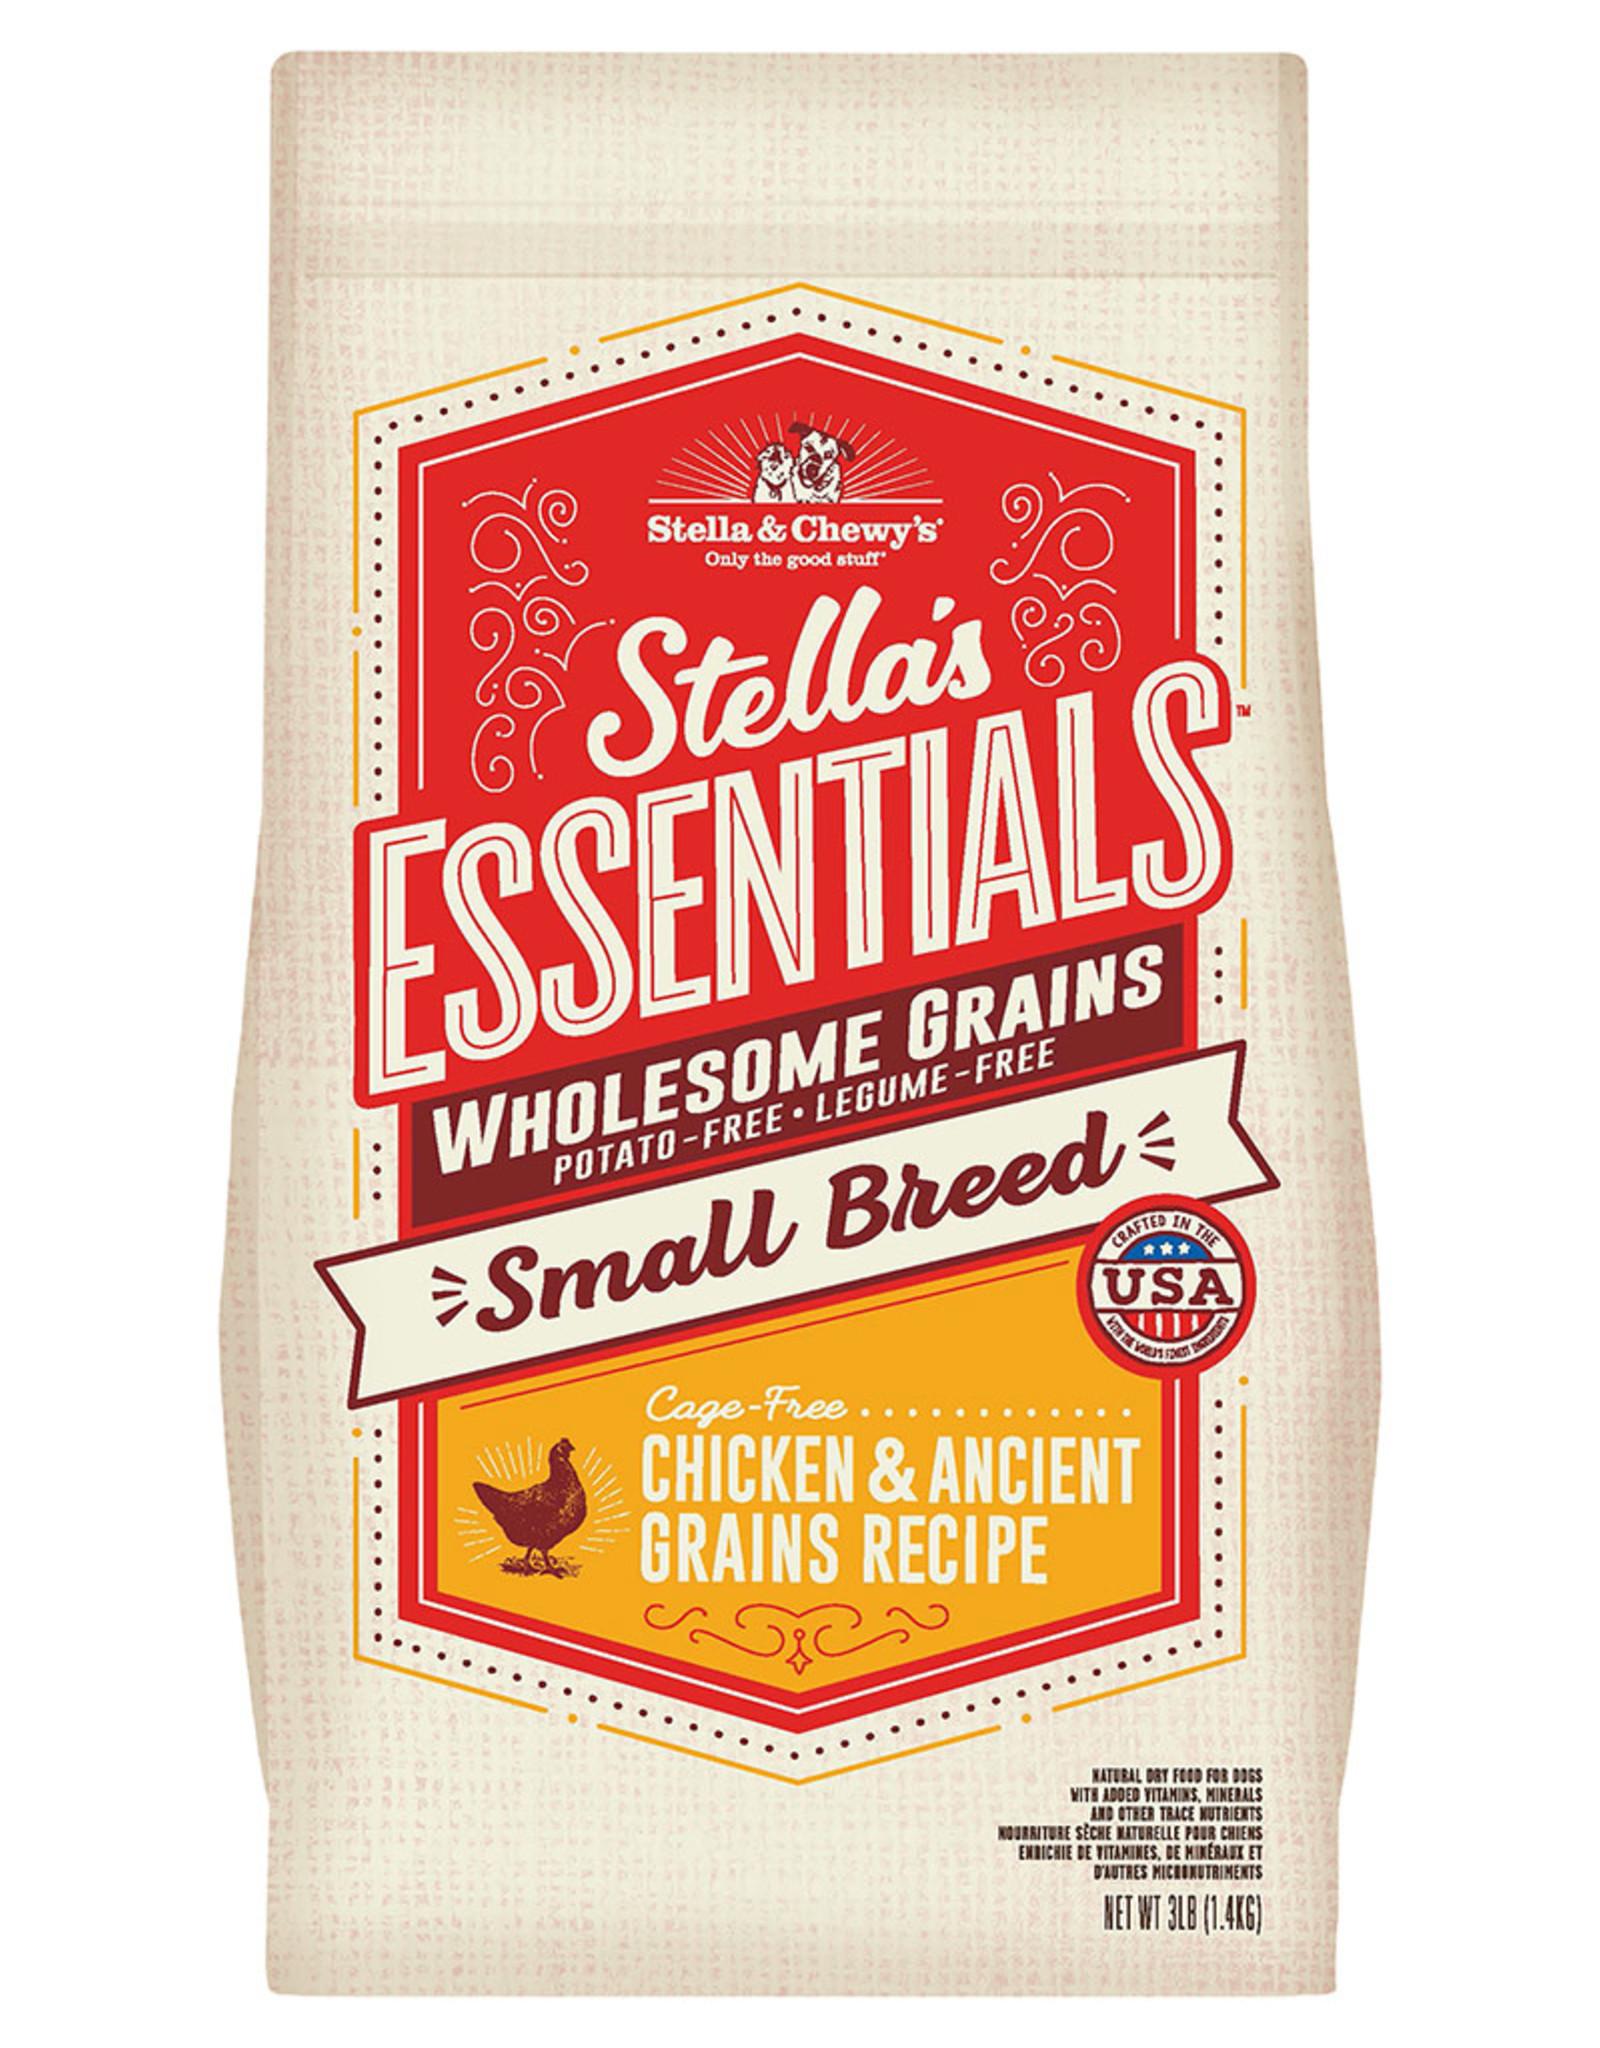 Stella & chewy's SC Essentials Chicken & Grains Small Breed 10LB